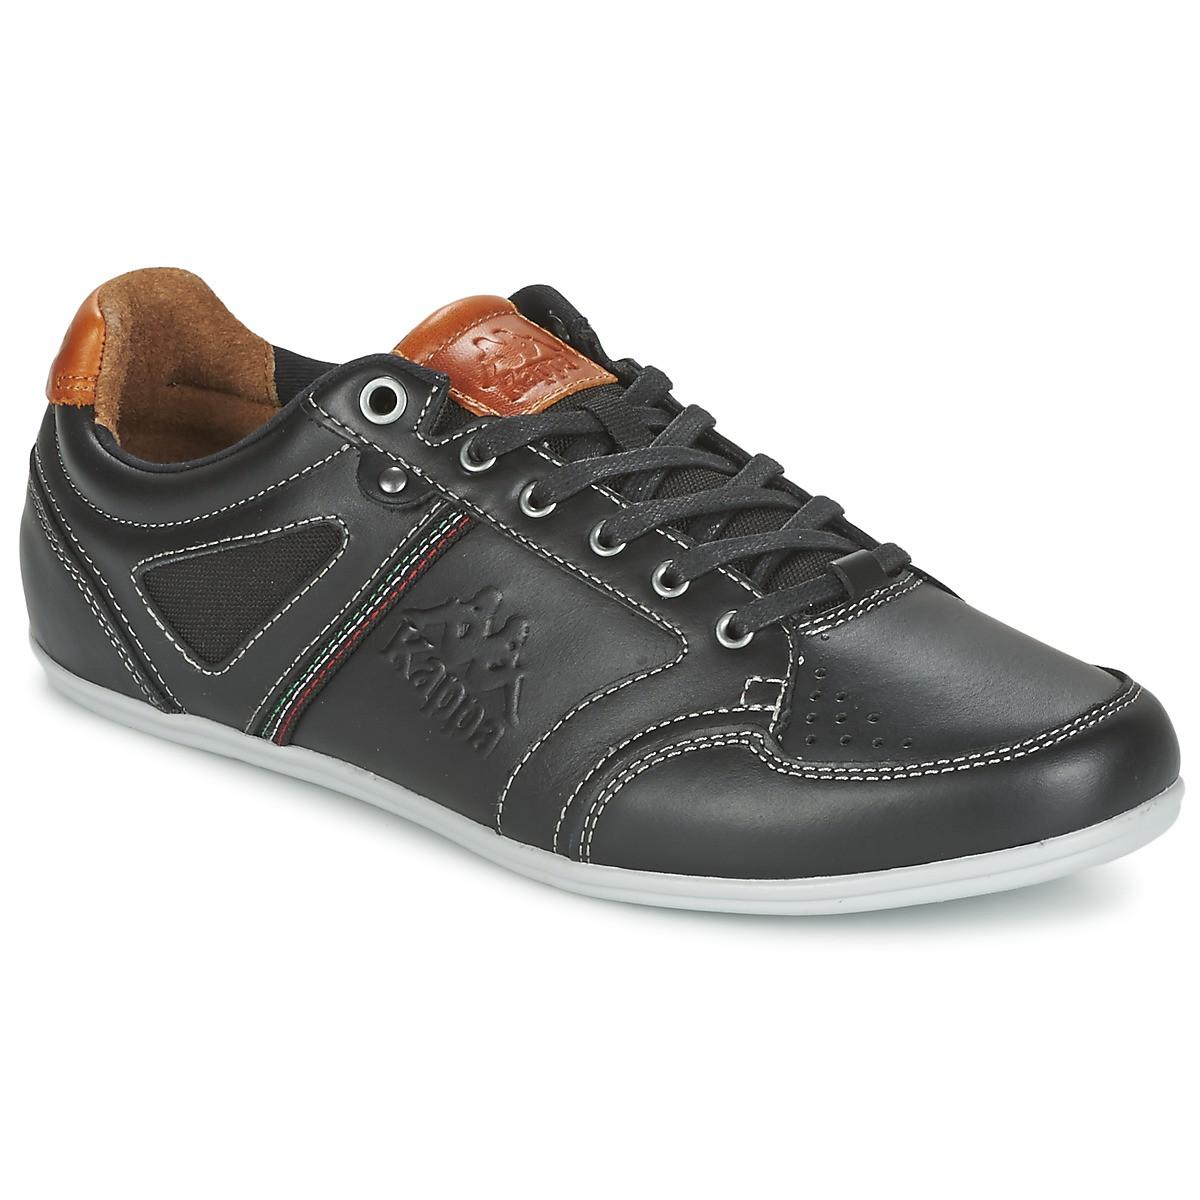 syringae chaussure homme kappa noir pas cher chaussures. Black Bedroom Furniture Sets. Home Design Ideas